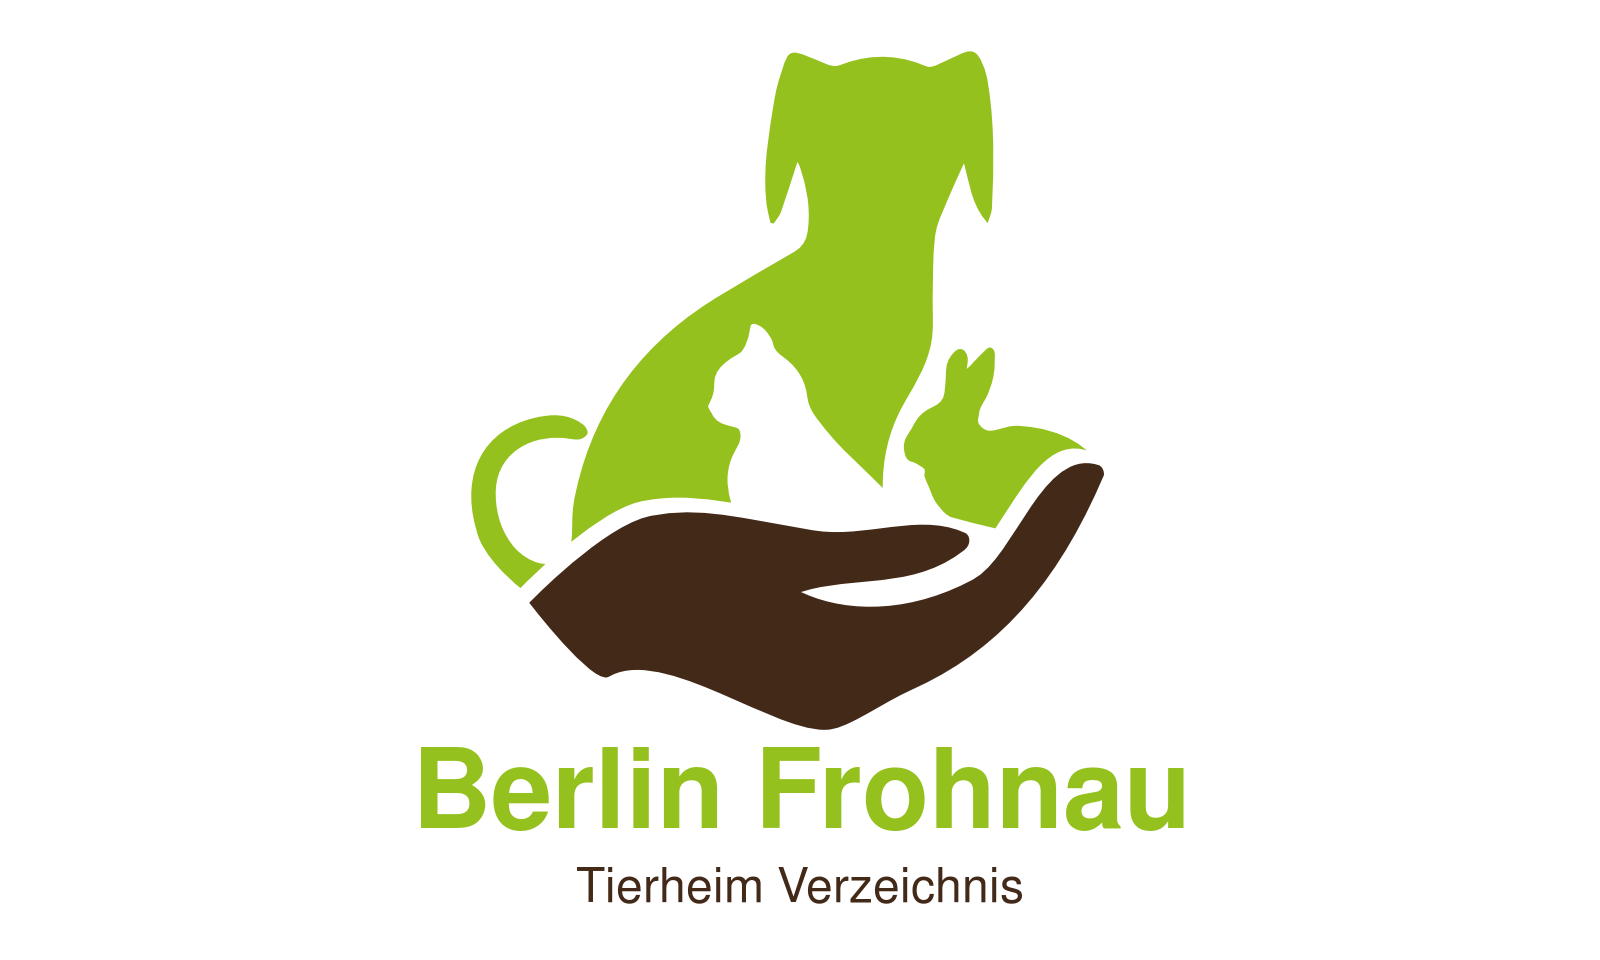 Tierheim Berlin Frohnau